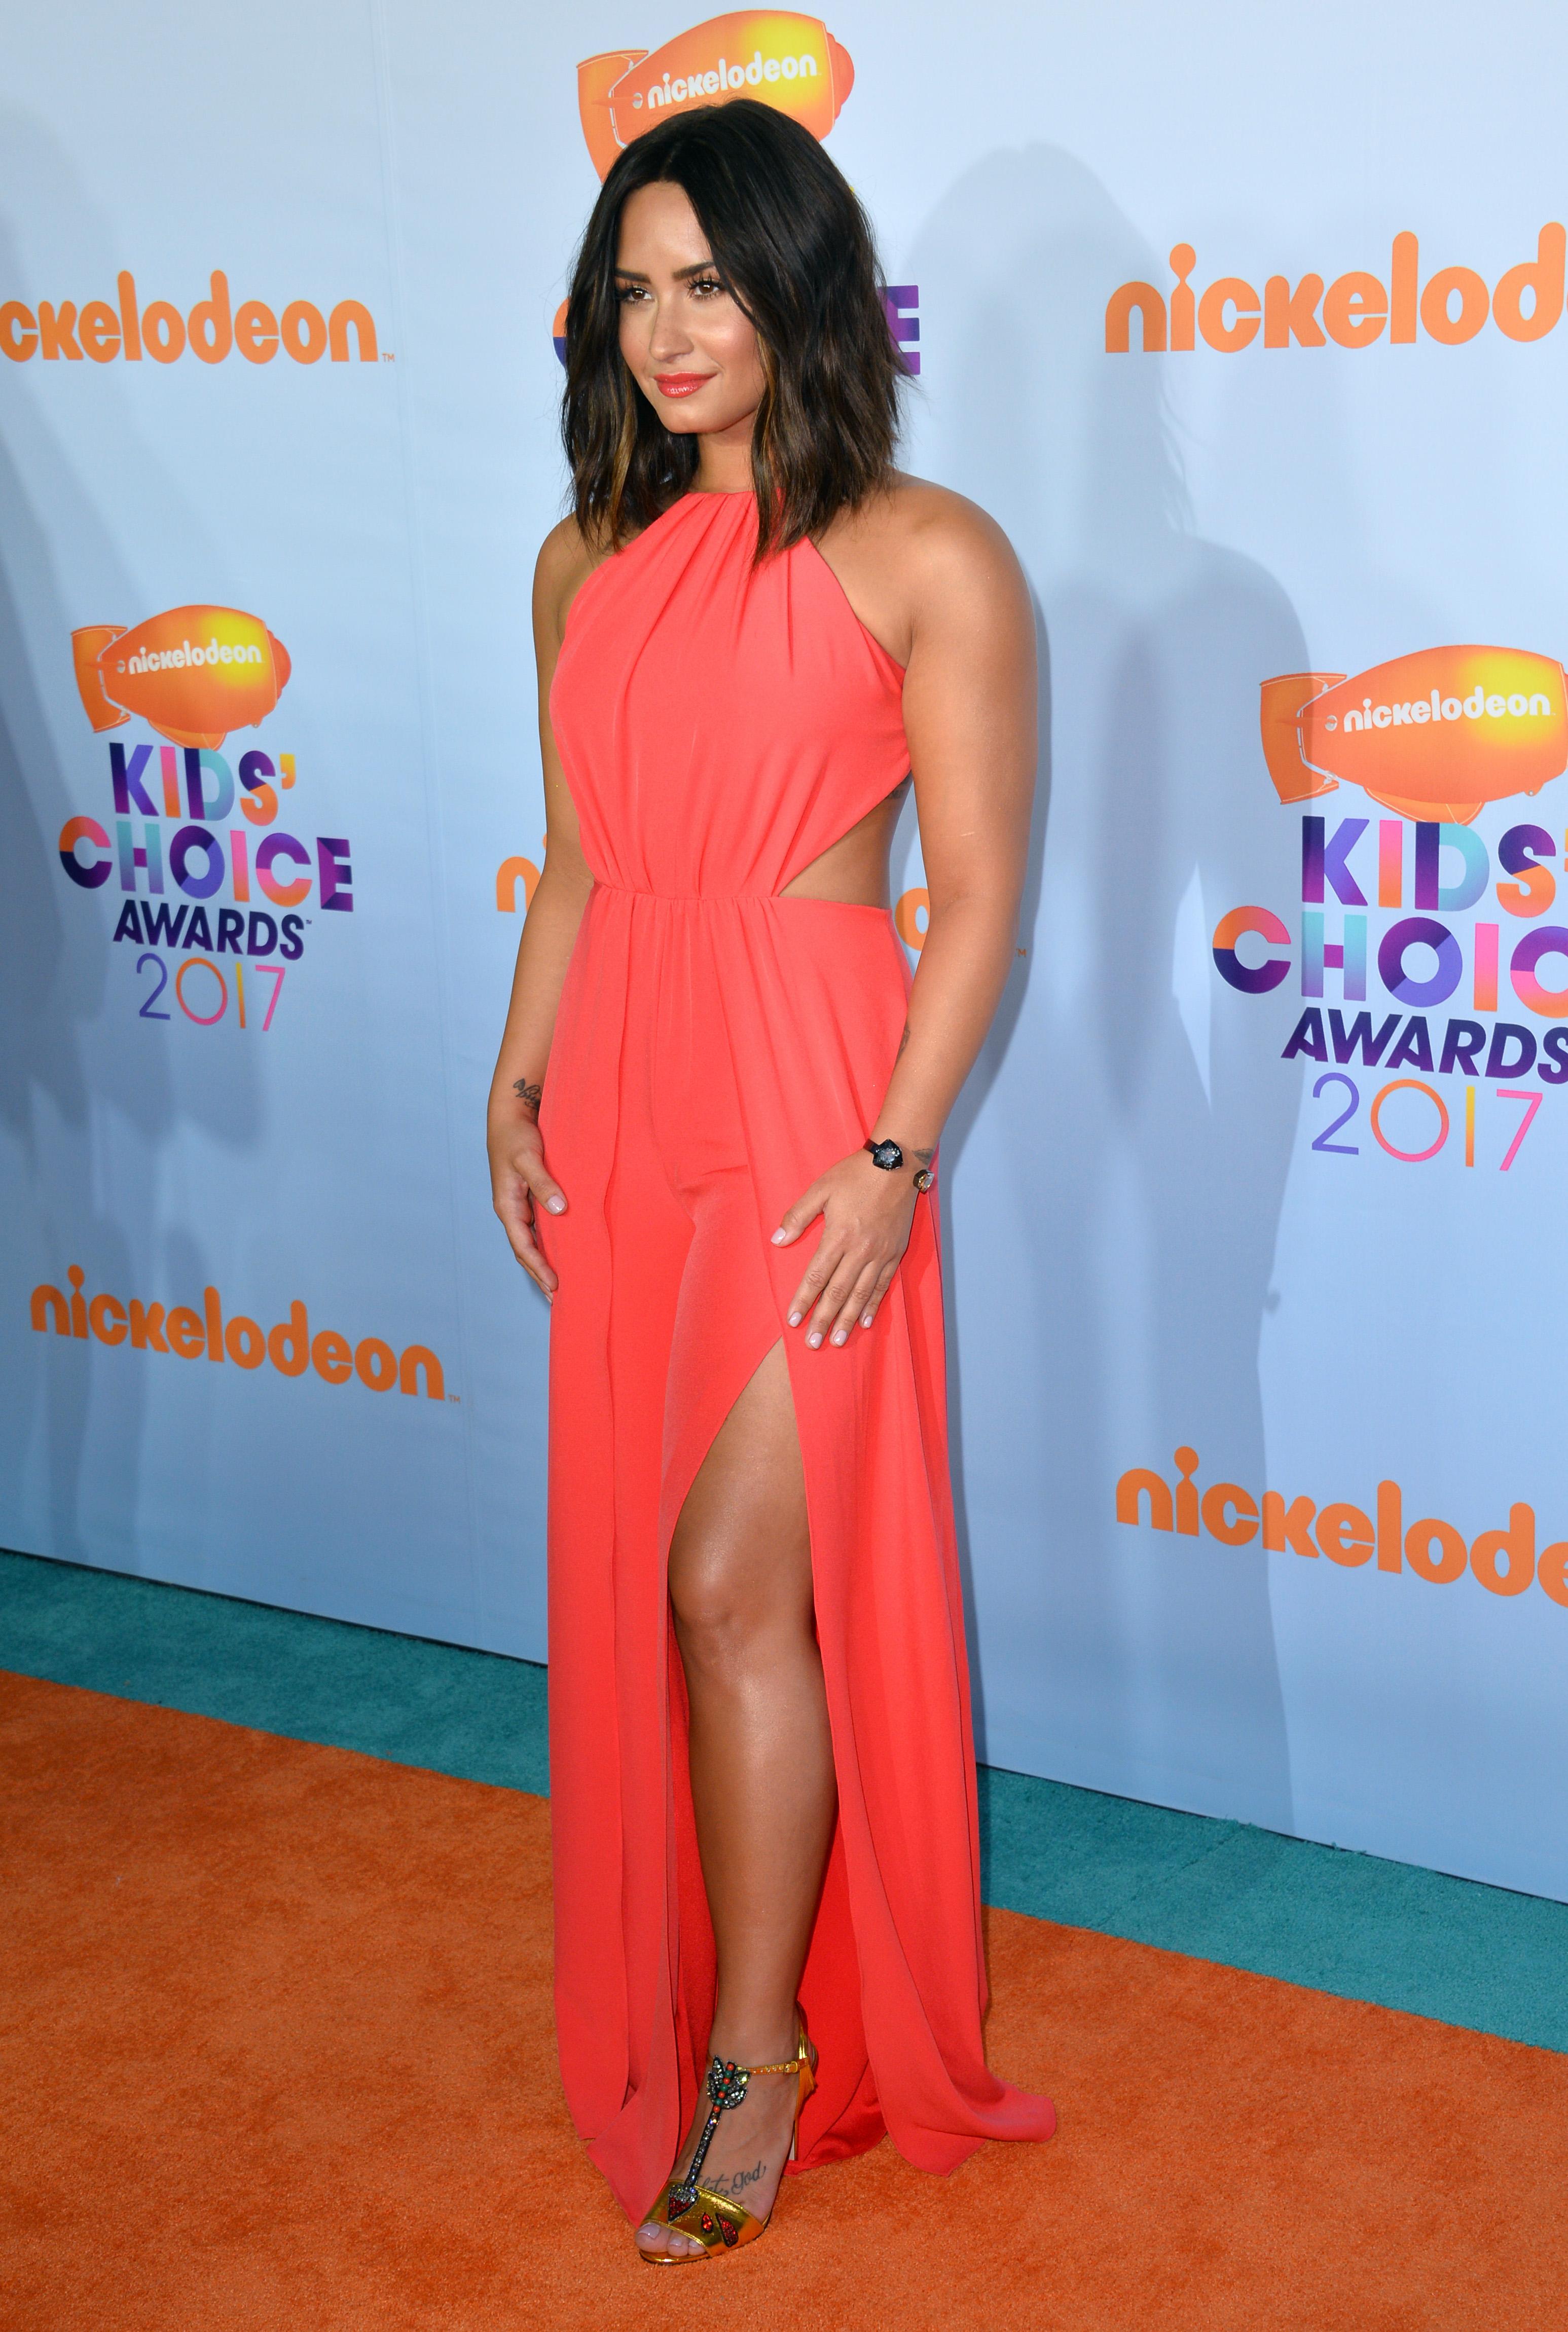 Demi LovatoKids Choice Awards 2017, Los Angeles 11 Mar 2017